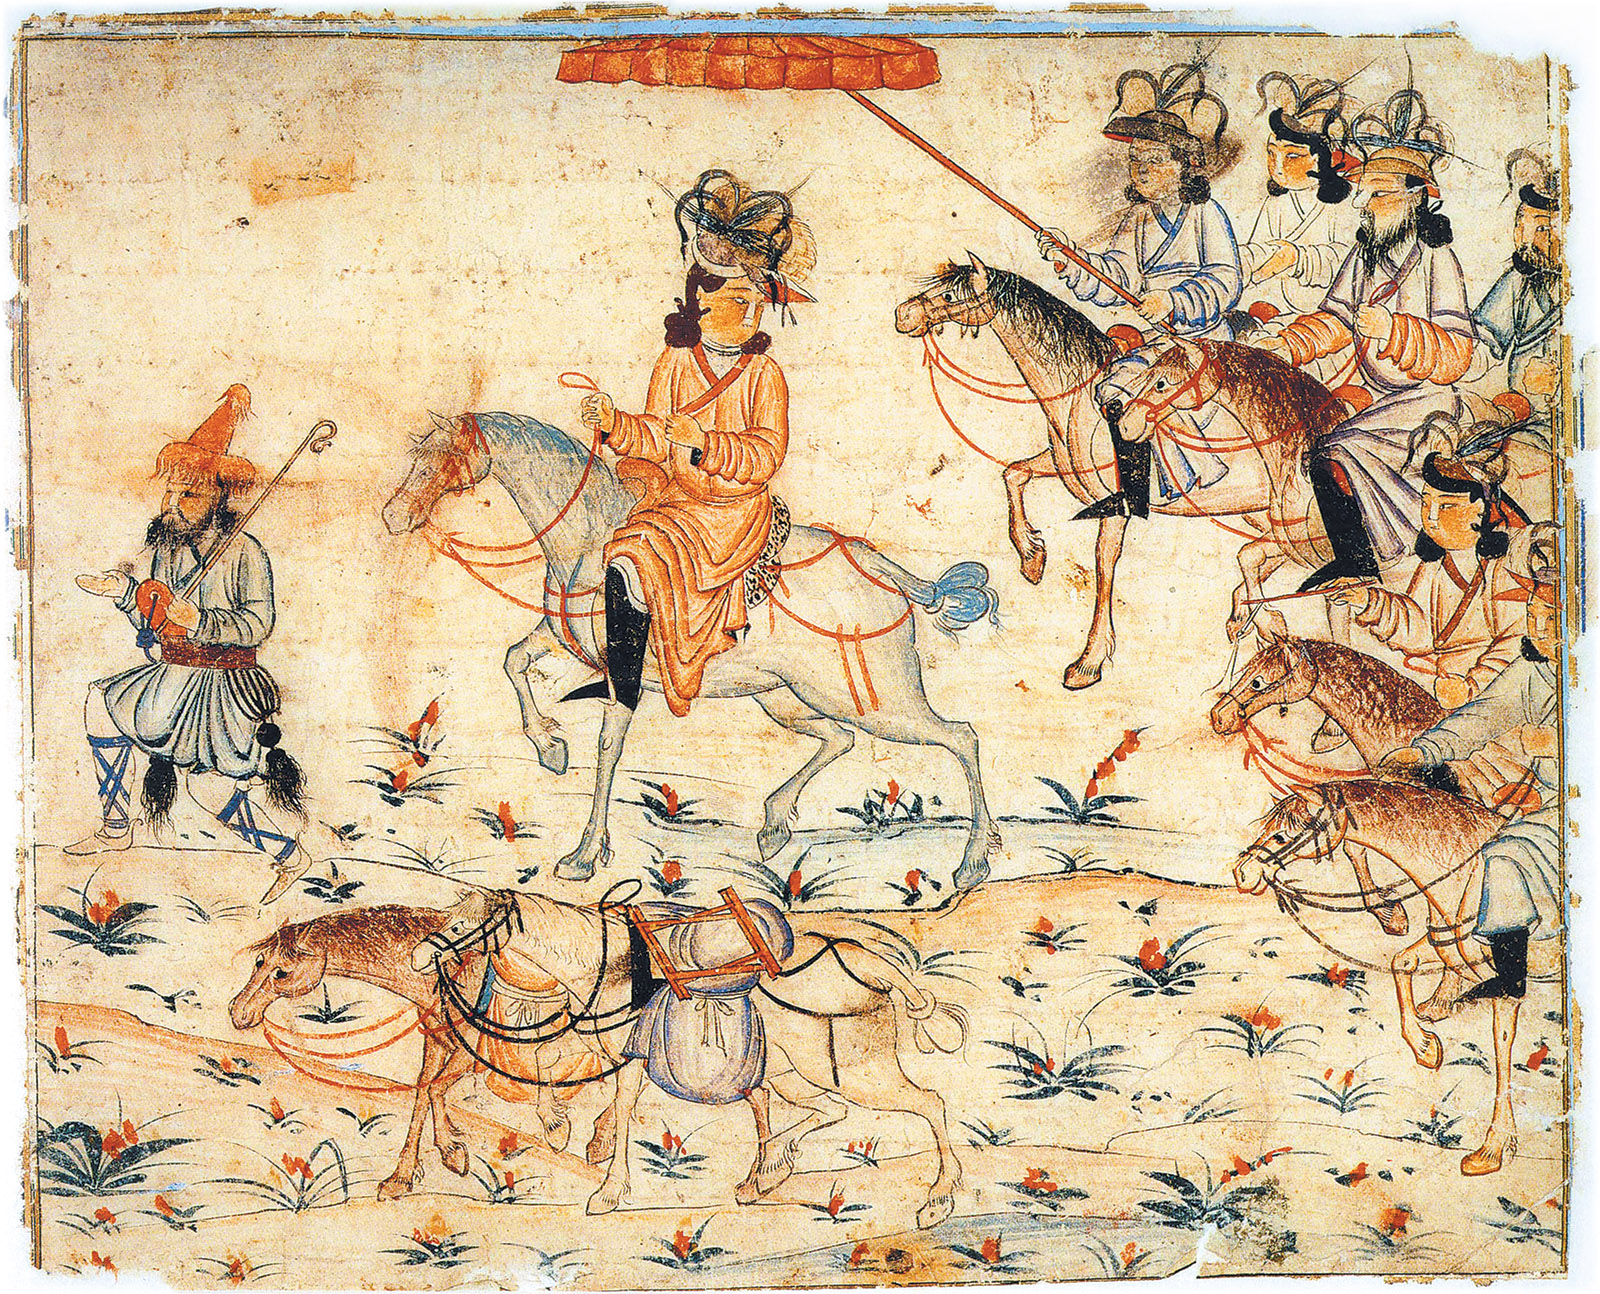 A Mongol khan on campaign; illustration from the Jamiʿ al-tawarikh